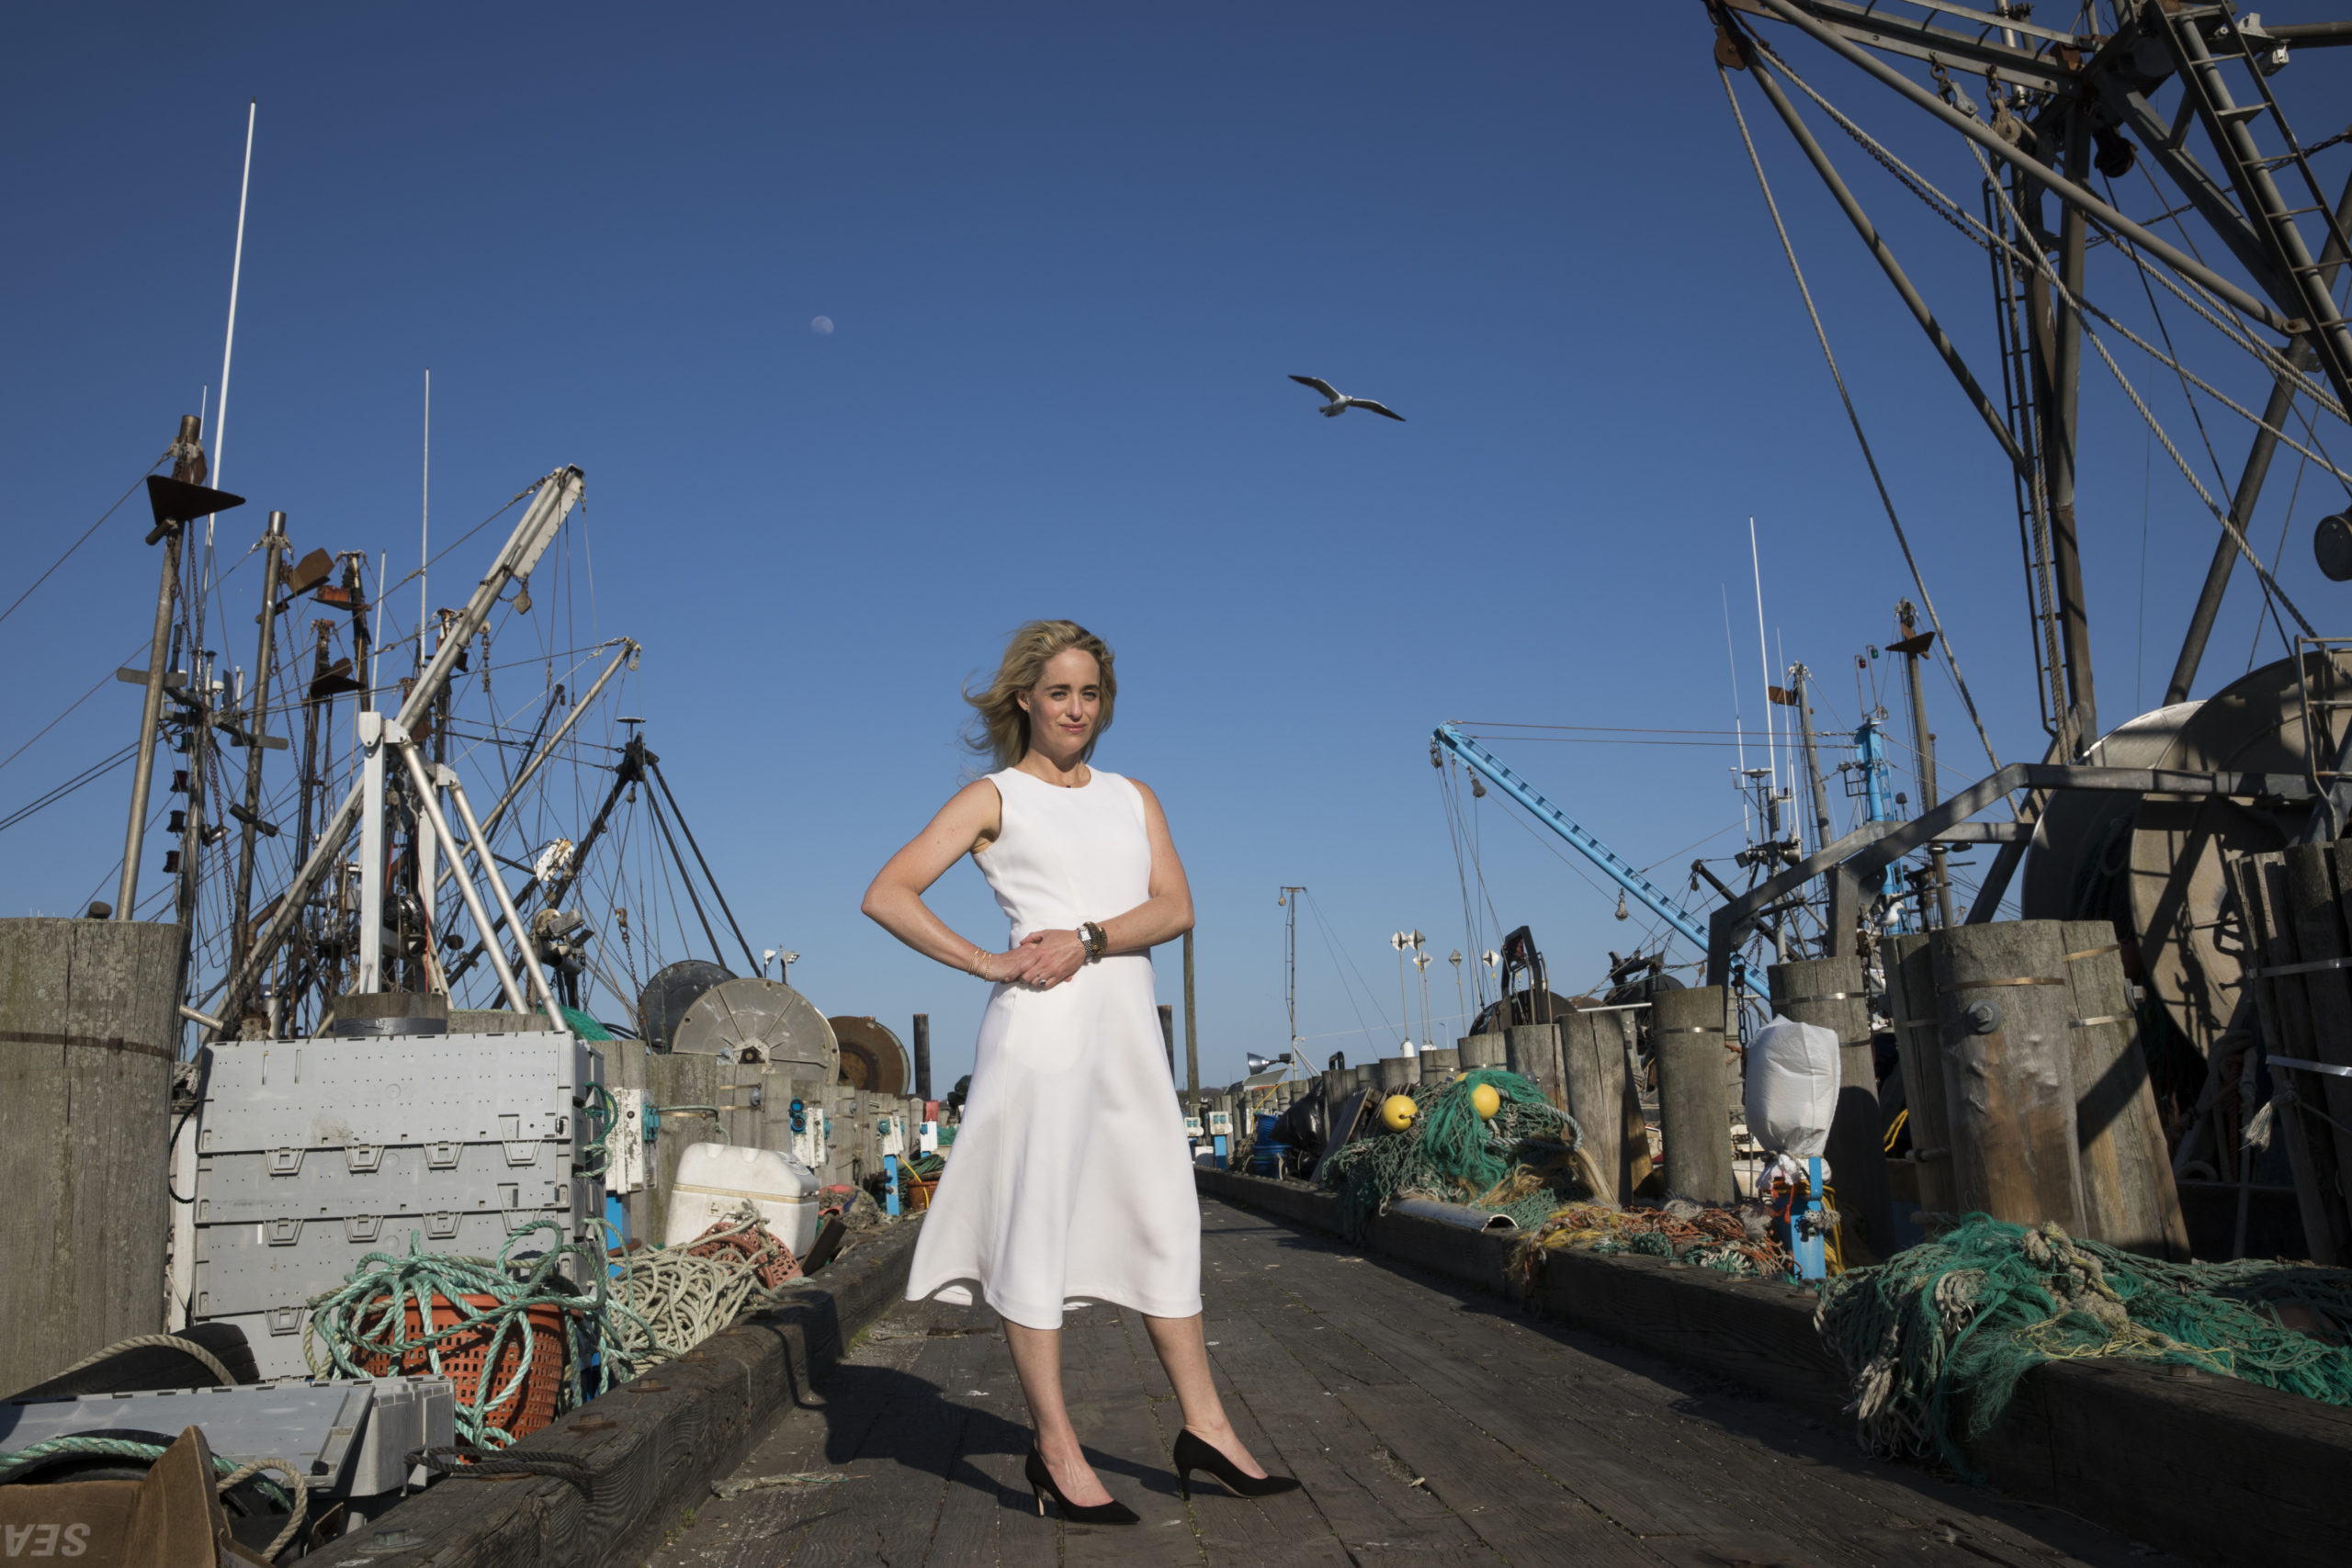 Amanda Fairbanks at the commercial fishing docks in Montauk. Lori Hawkins photo